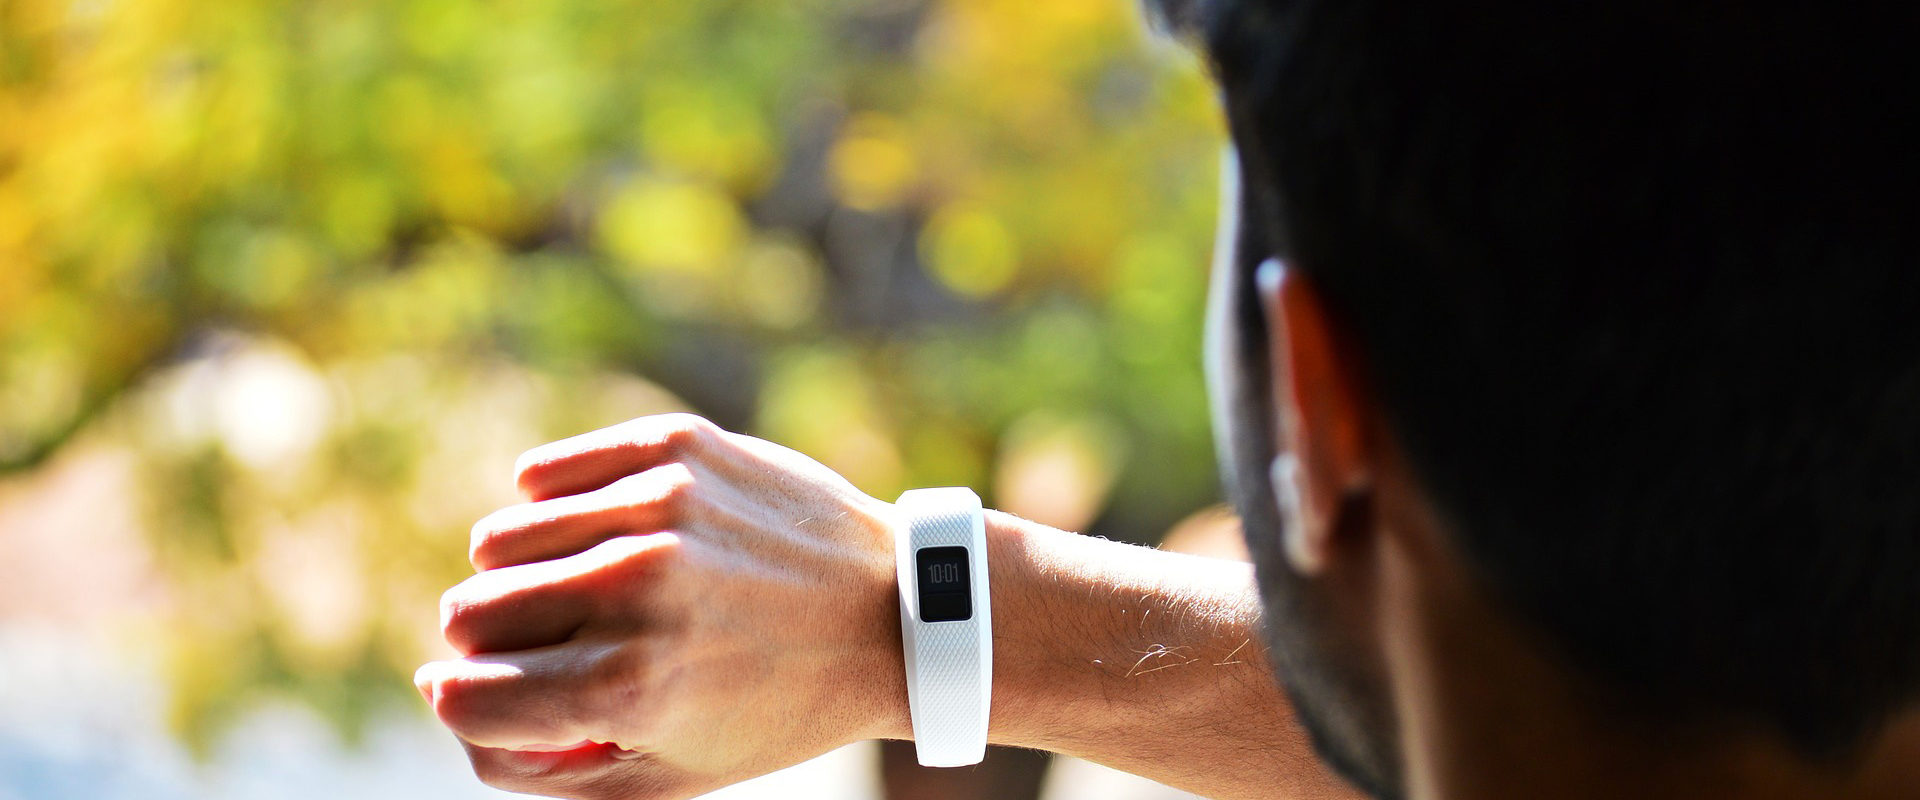 Permalink zu:Smartwatch vs. Fitnesstracker